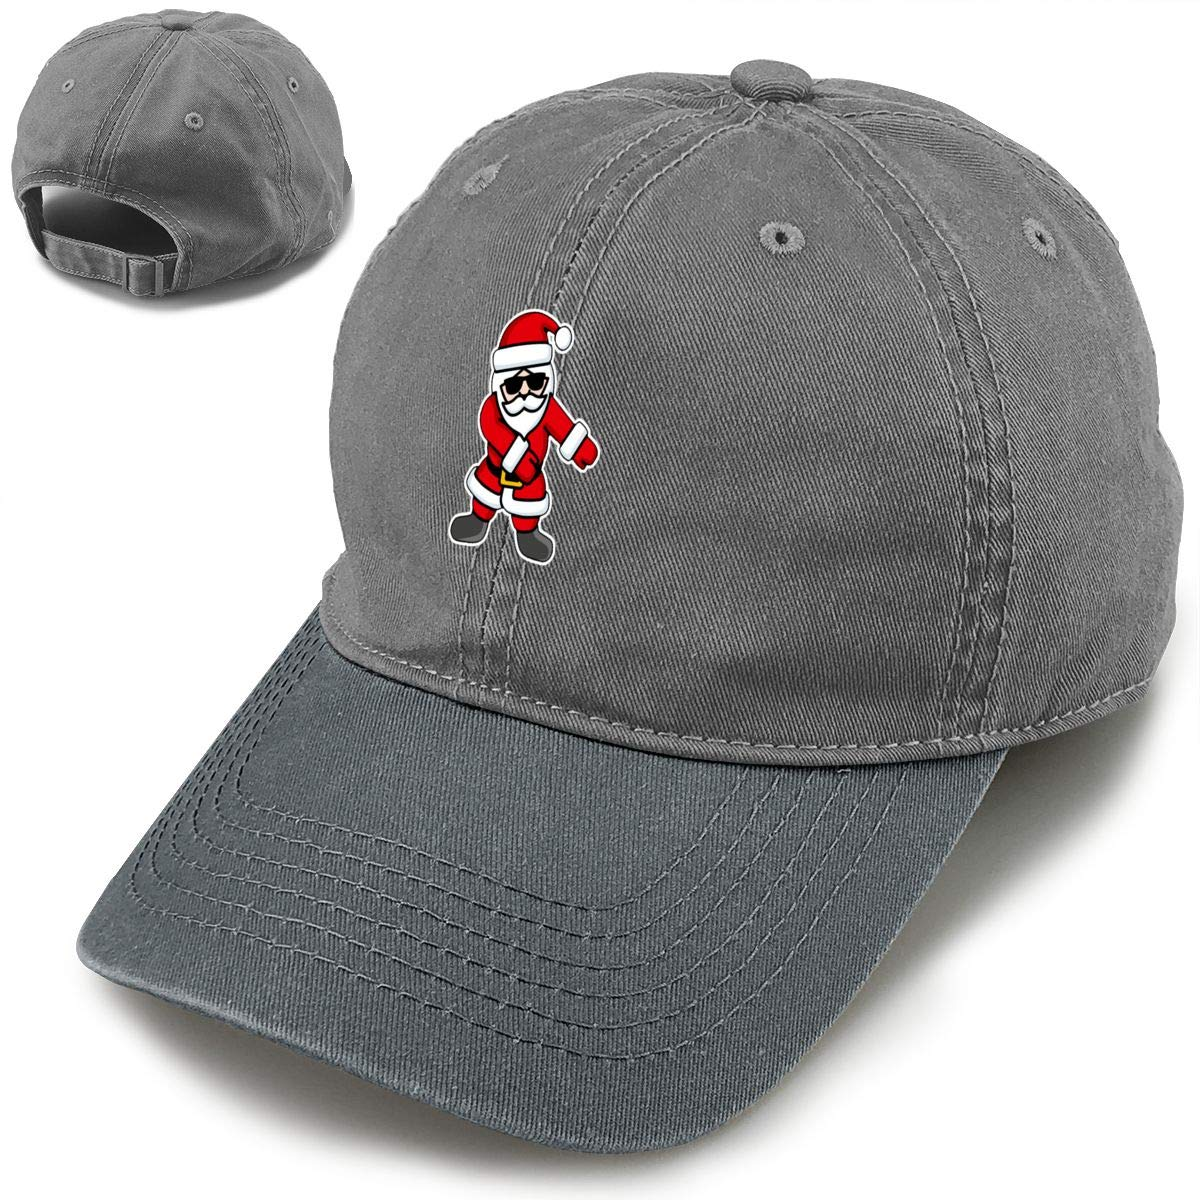 Here Comes Santa Floss Dance Flossing Santa Claus Classic Vintage Jeans Baseball Cap Adjustable Dad Hat for Women and Men